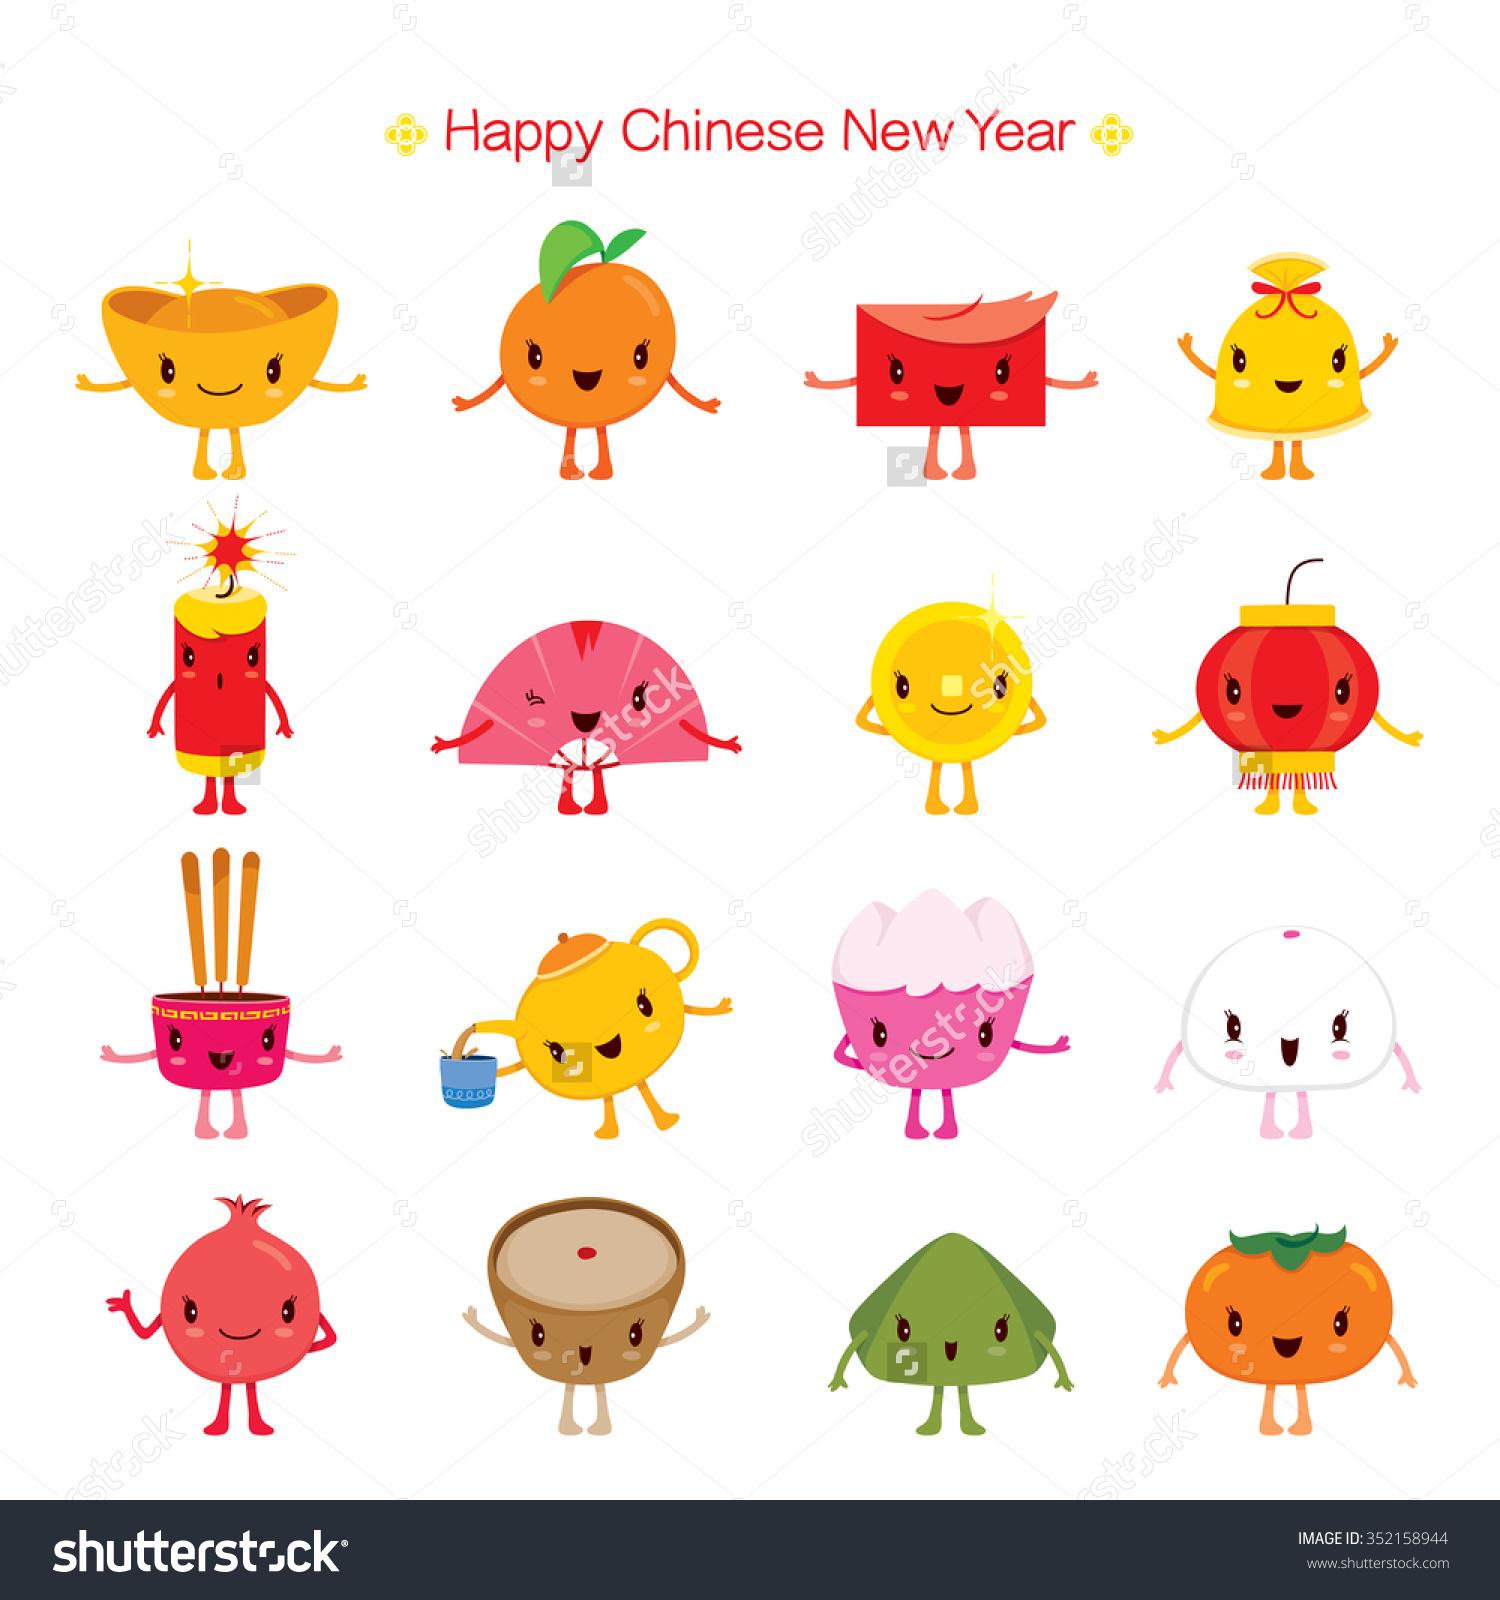 Chinese New Year Cute Cartoon Design Stock Vector 352158944.